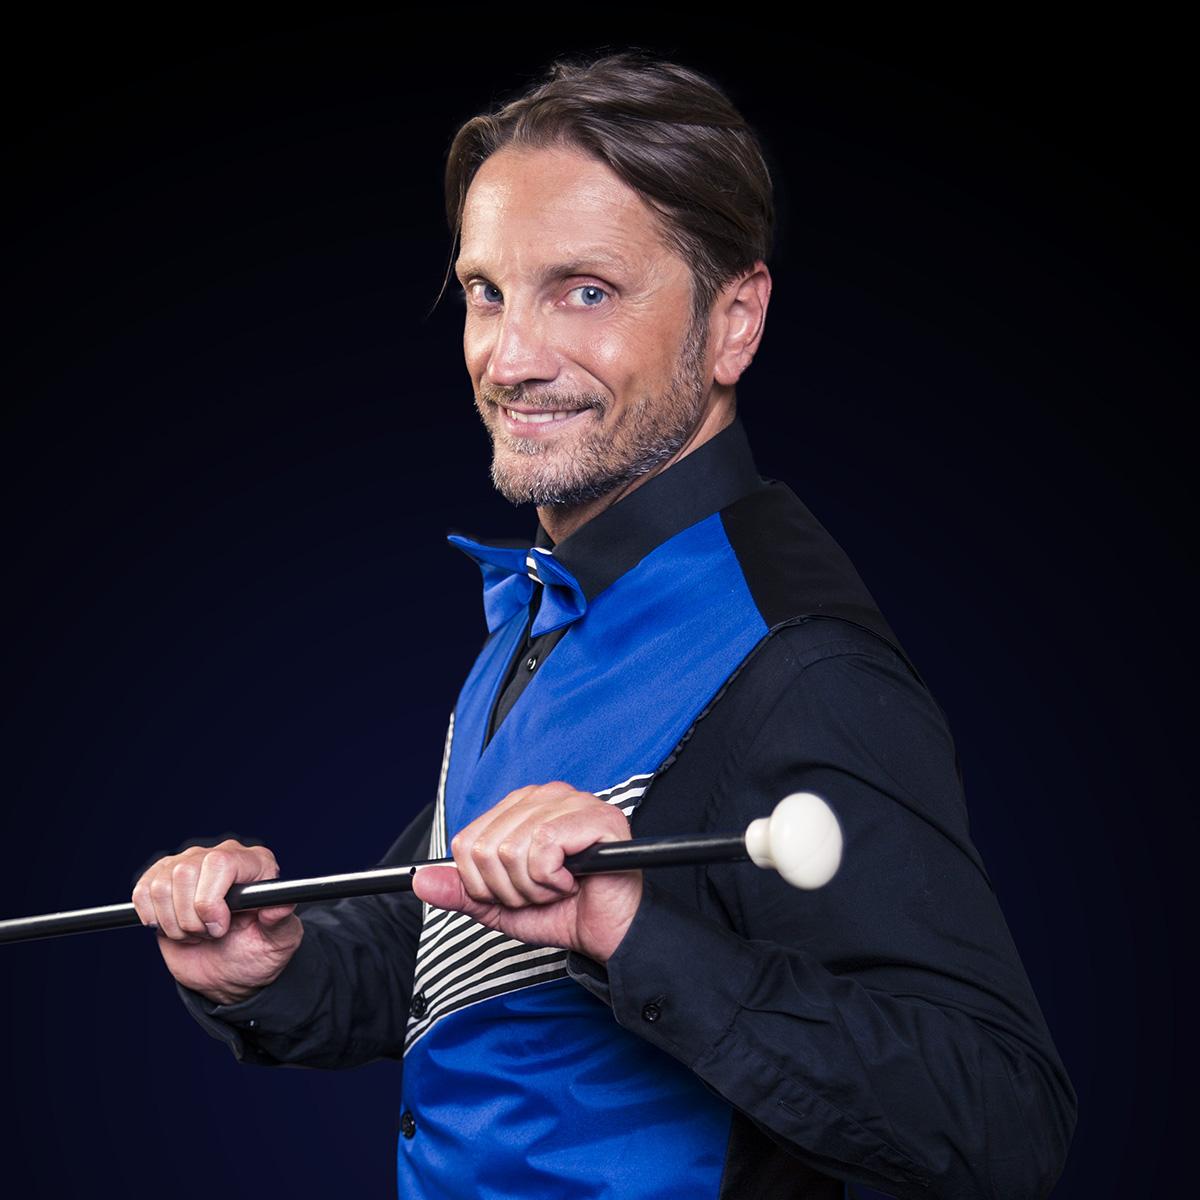 Fabrizio Aloisi